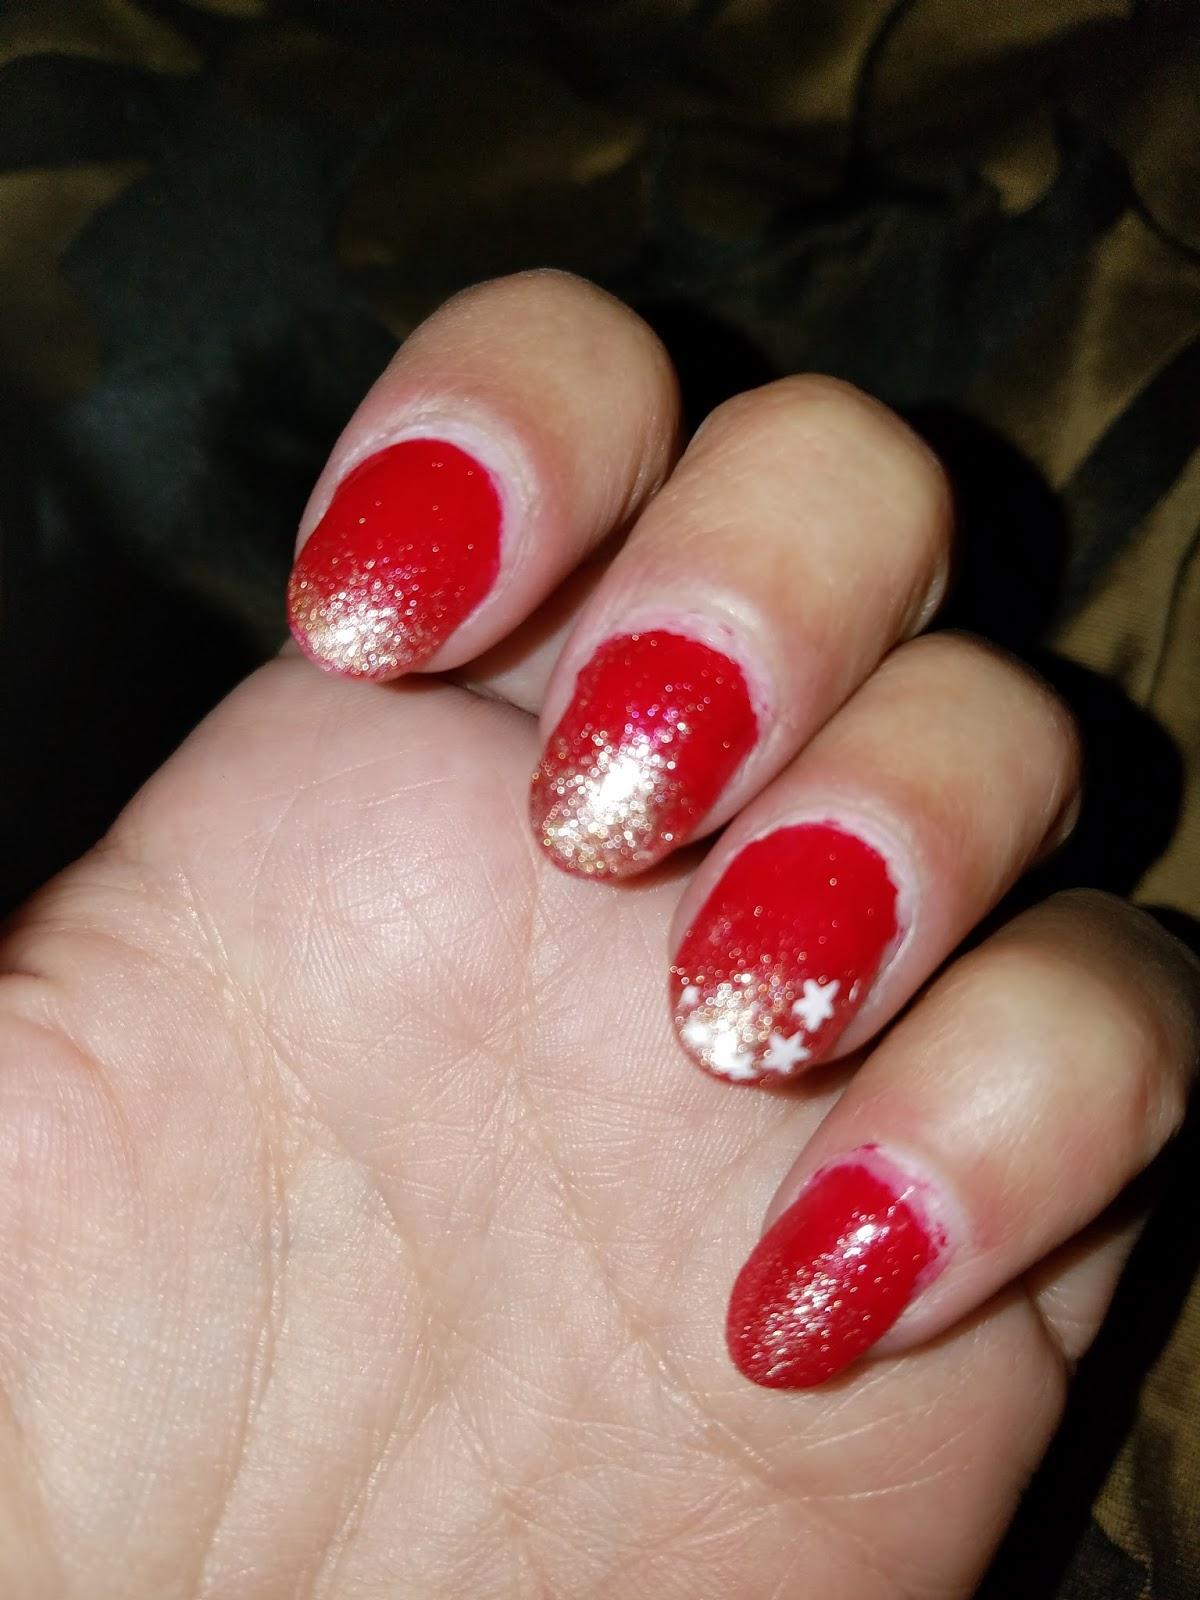 quick dip acrylic nails kit photo - 2